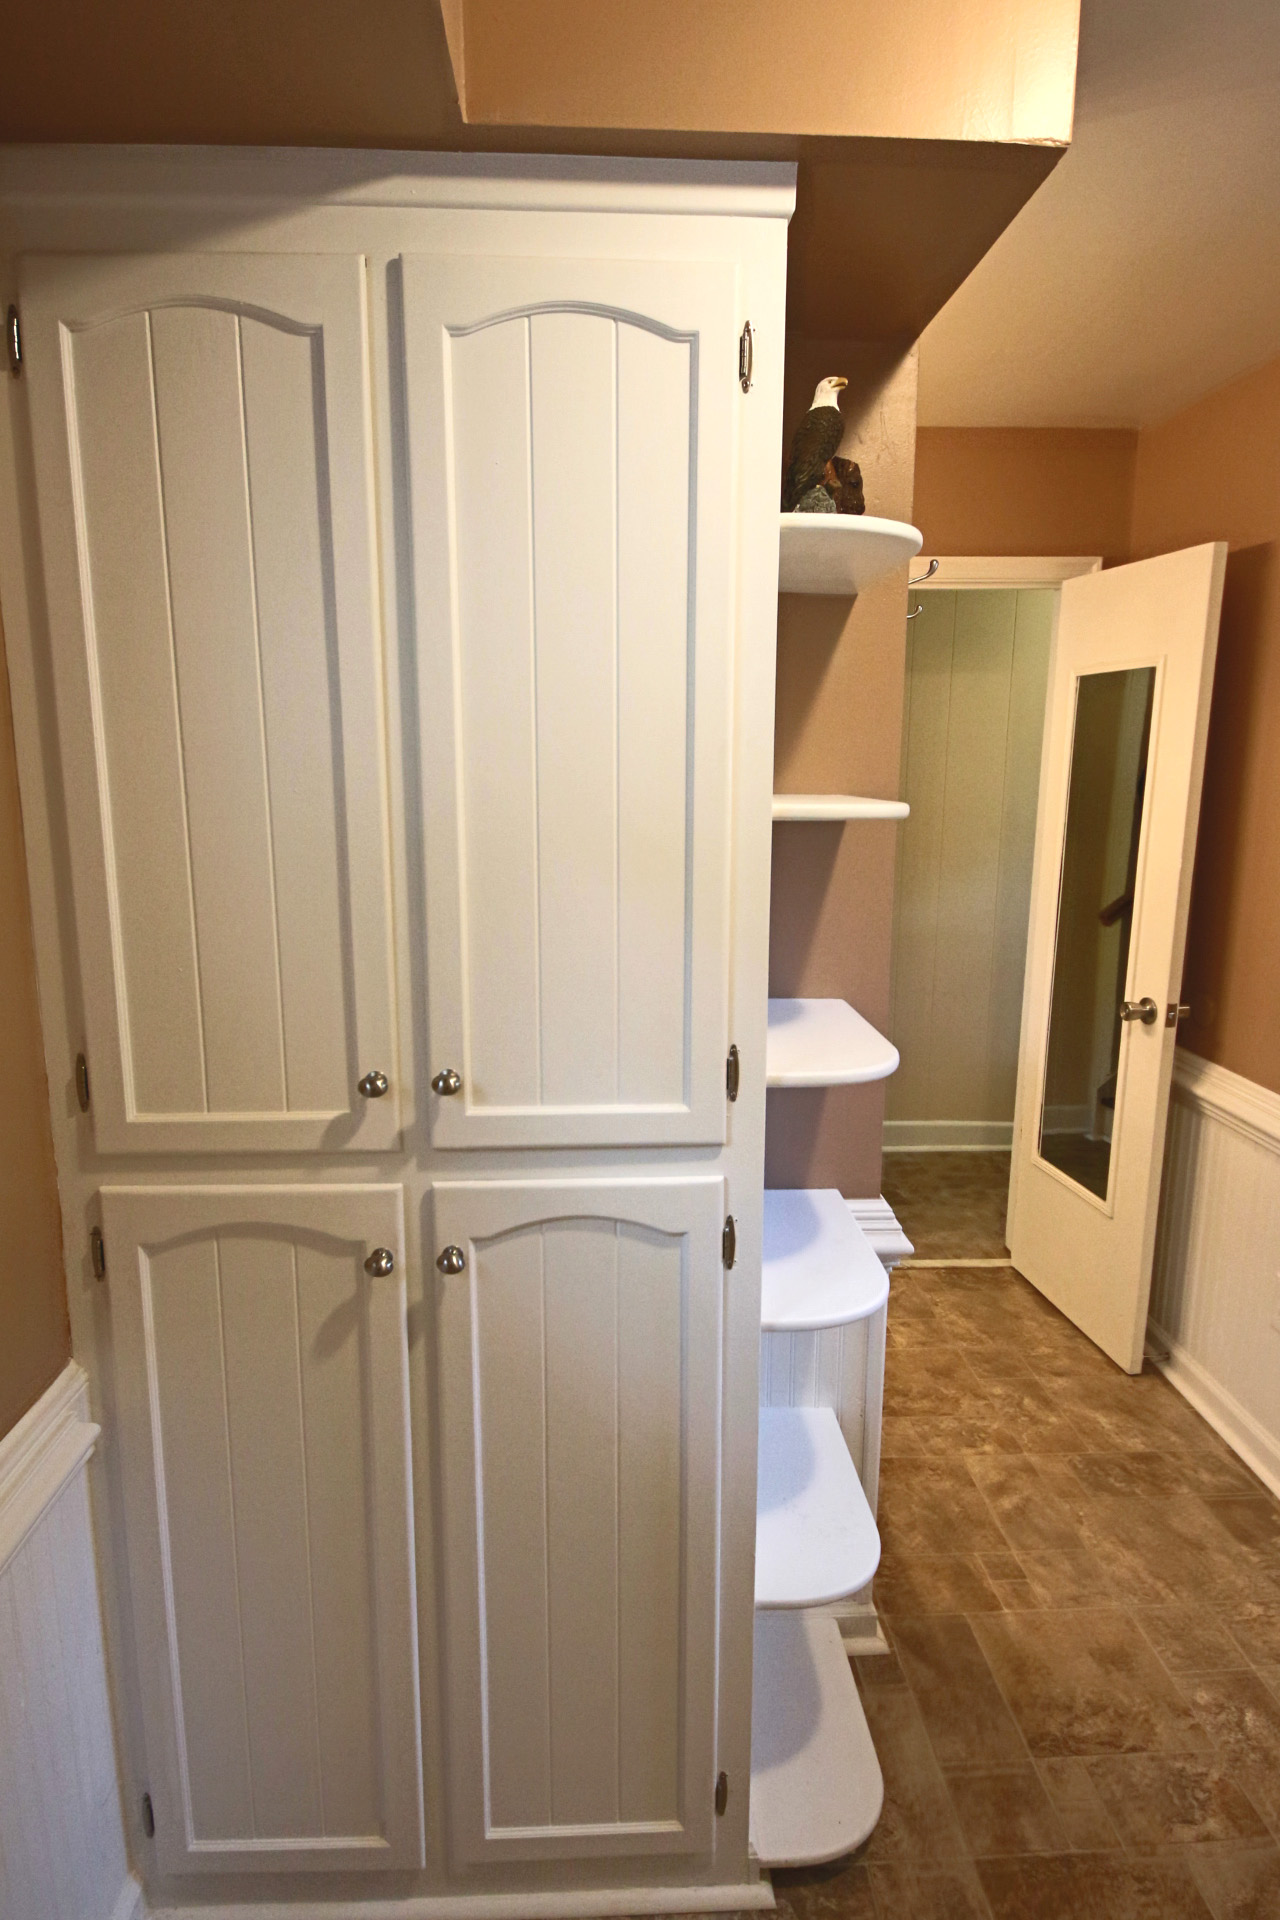 17. Downstairs Bathroom